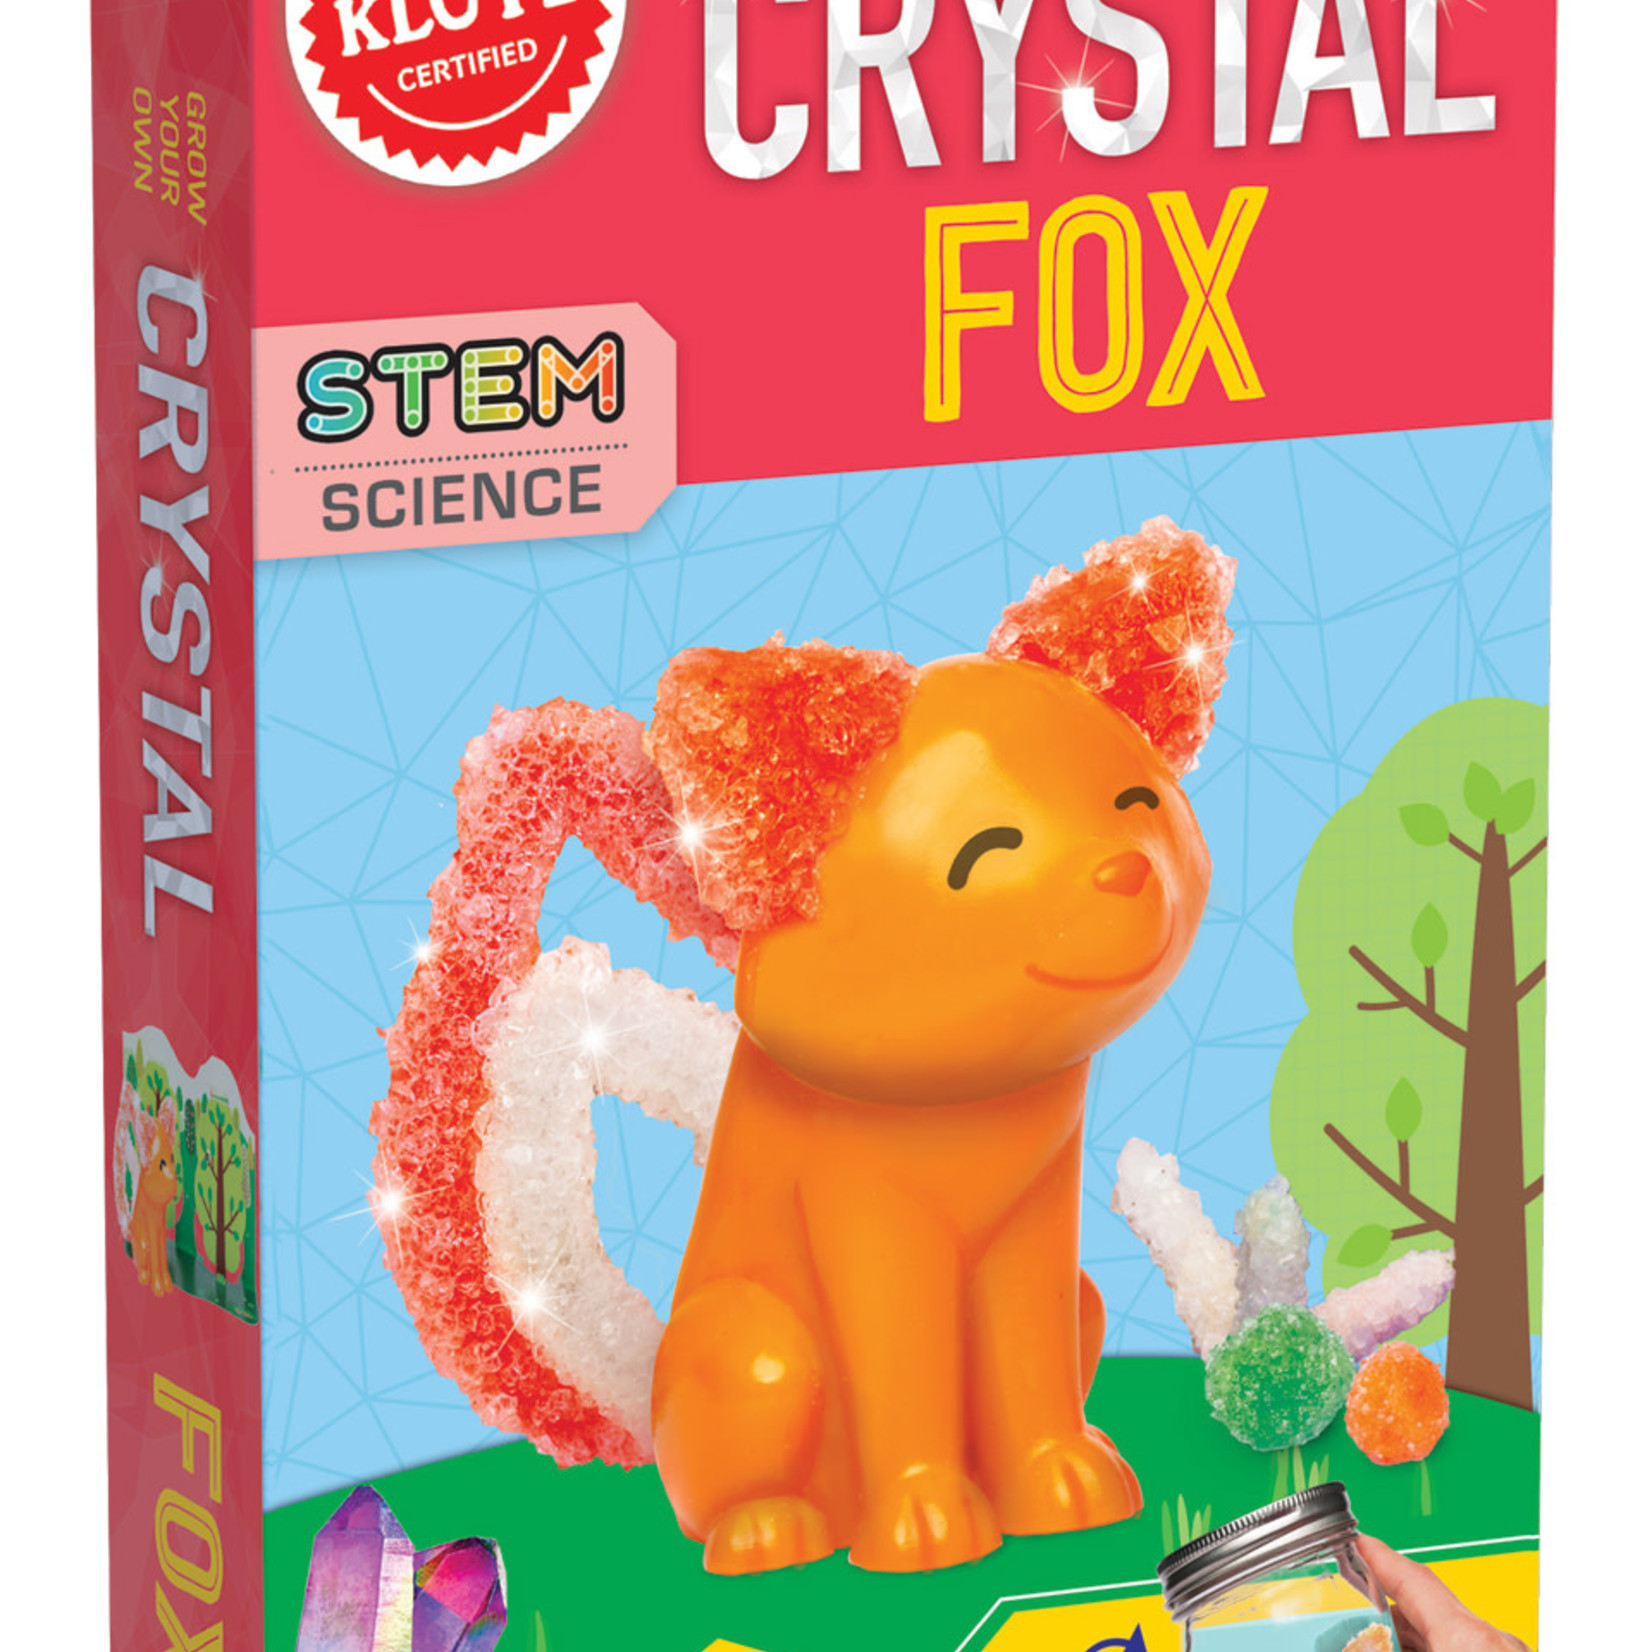 Klutz Crystal Fox